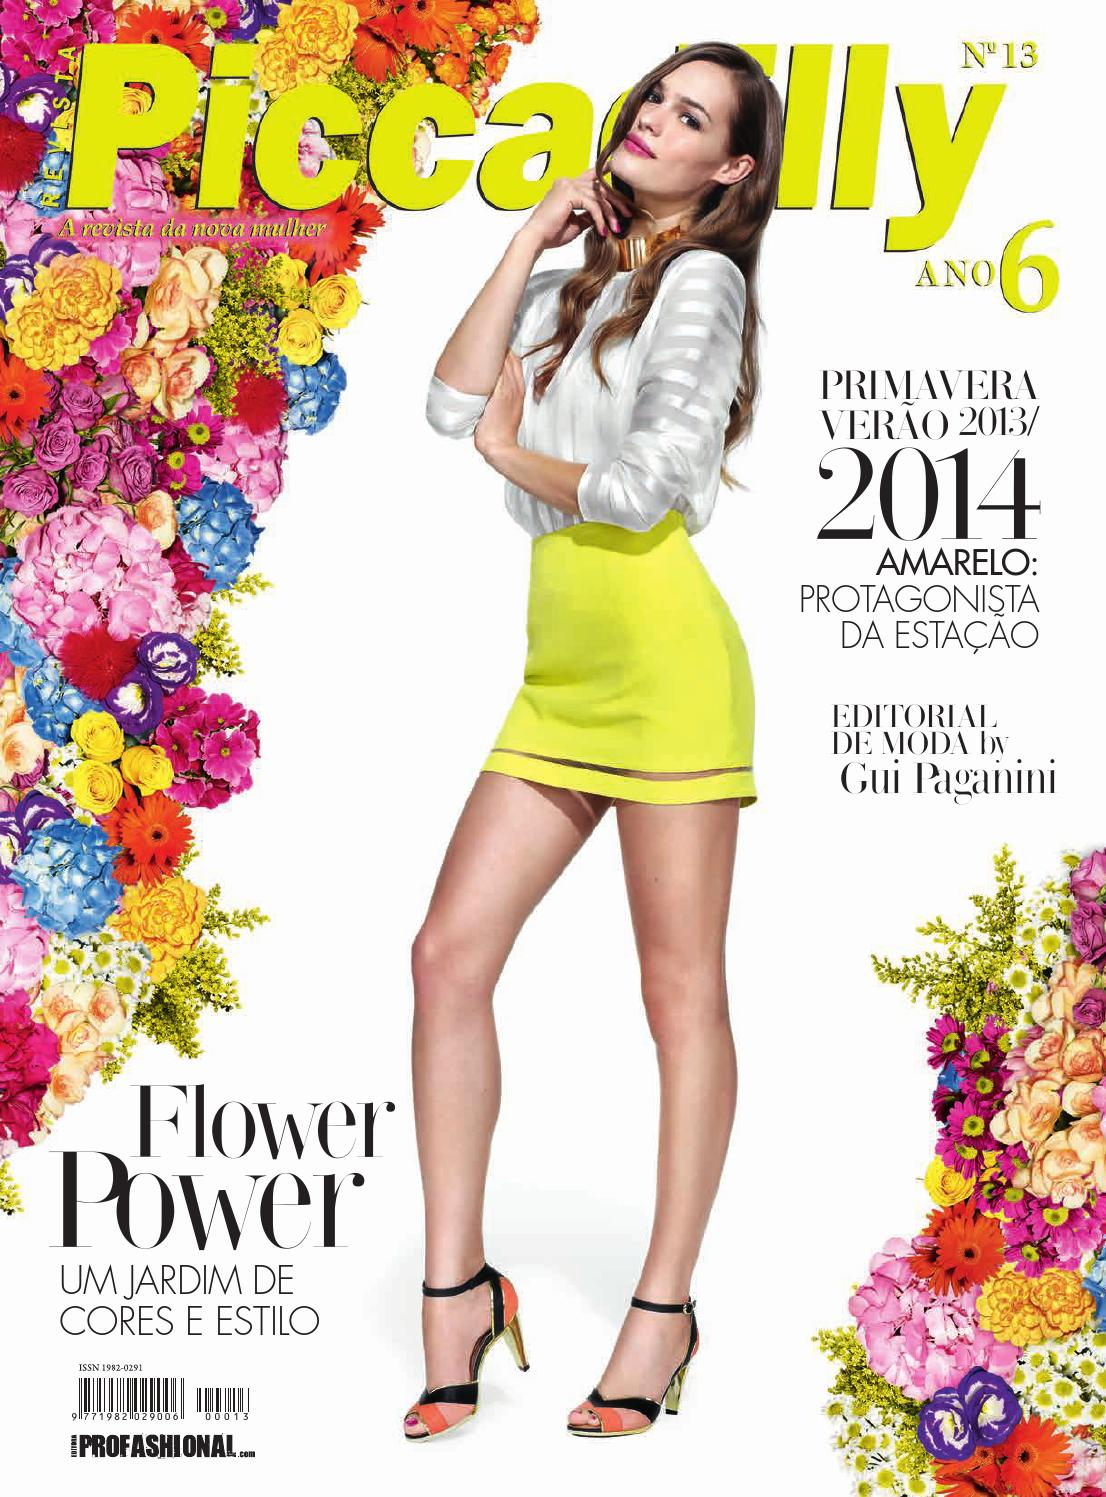 8624e3d694 Revista Piccadilly - ed 13 by Profashional Editora - issuu